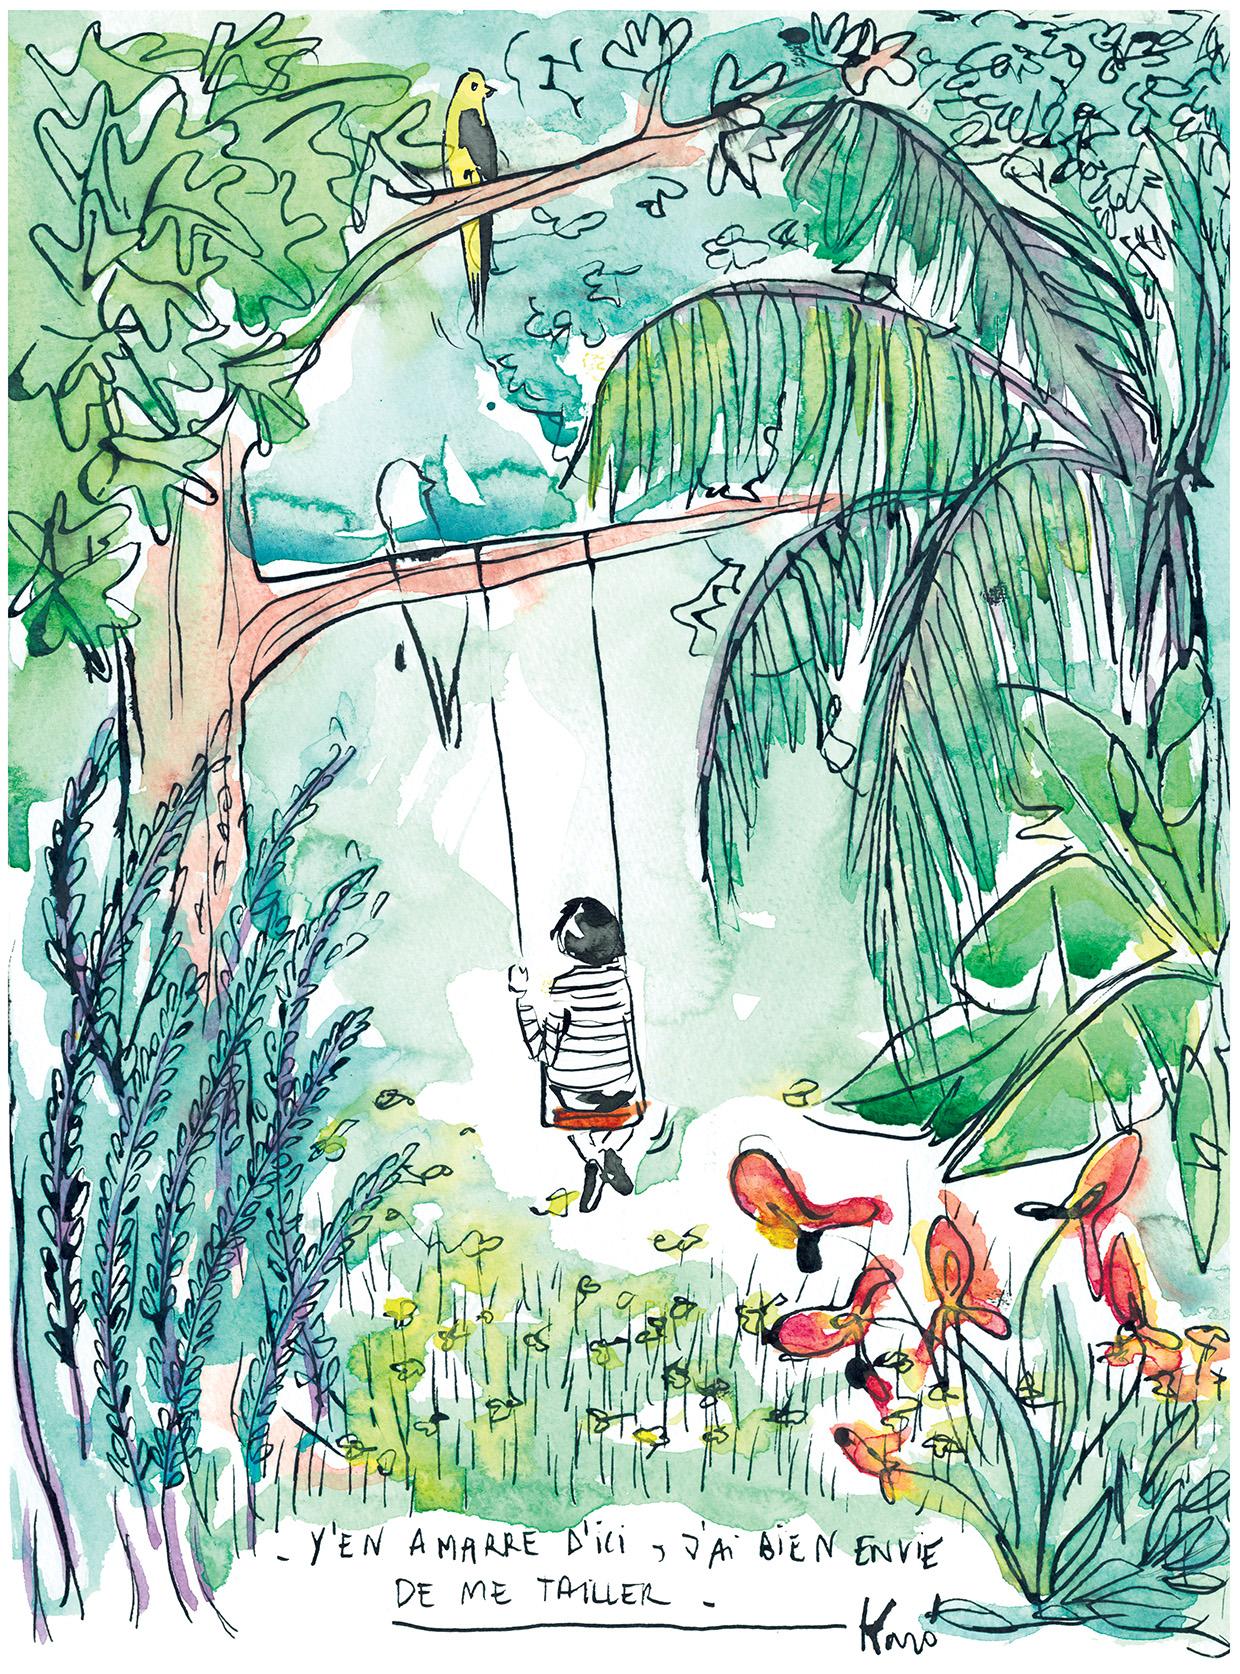 Wild_karopauwels_illustrations